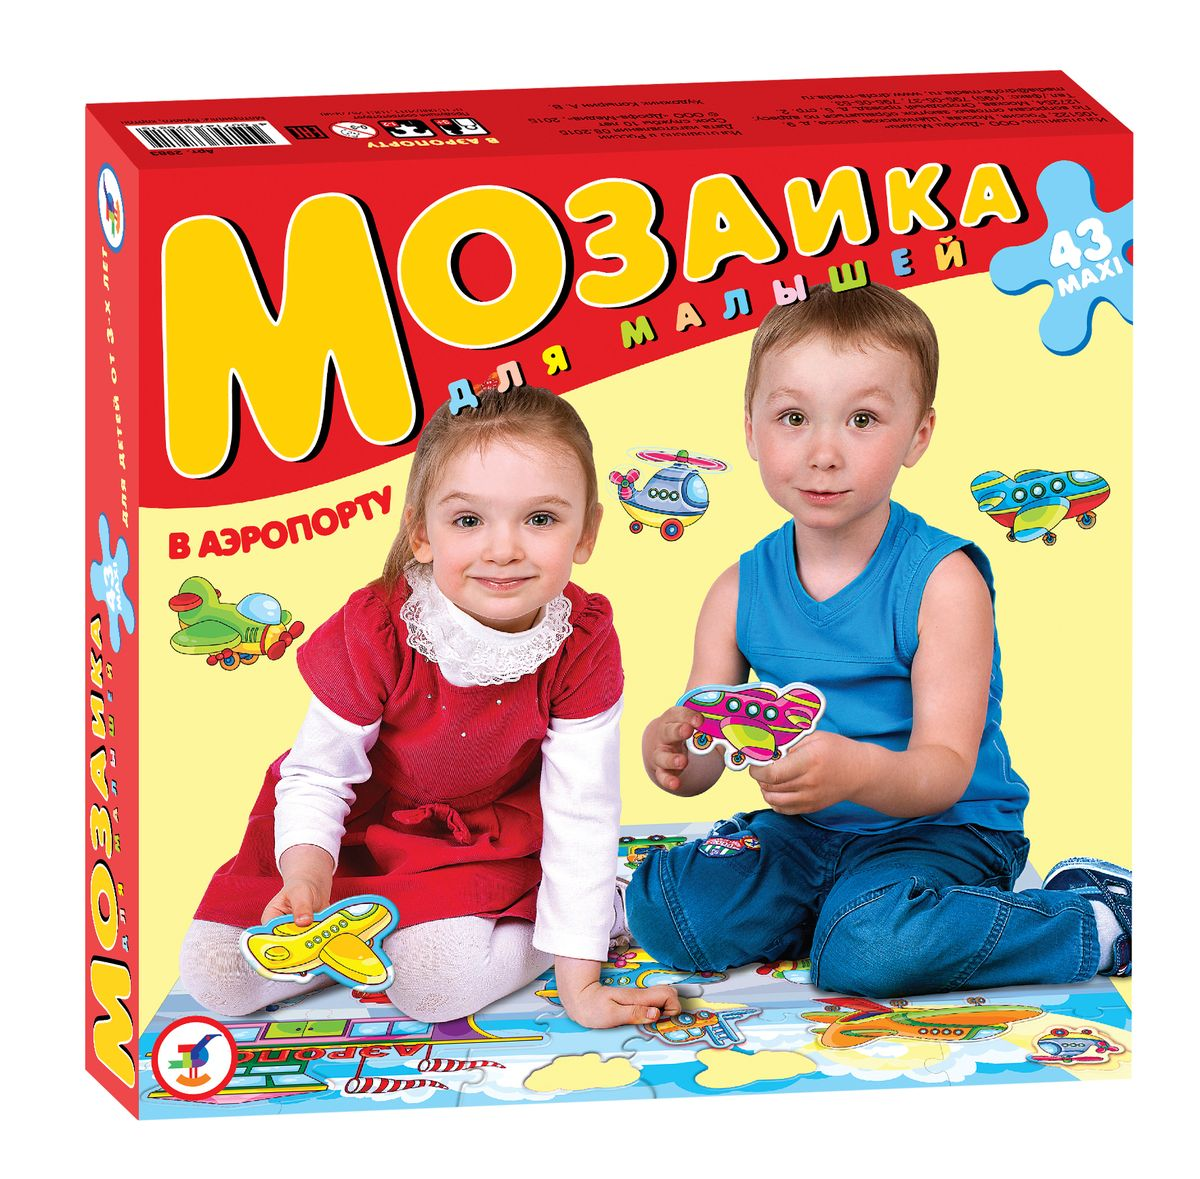 Дрофа-Медиа Пазл для малышей В аэропорту дрофа медиа пазл для малышей репка 8 в 1